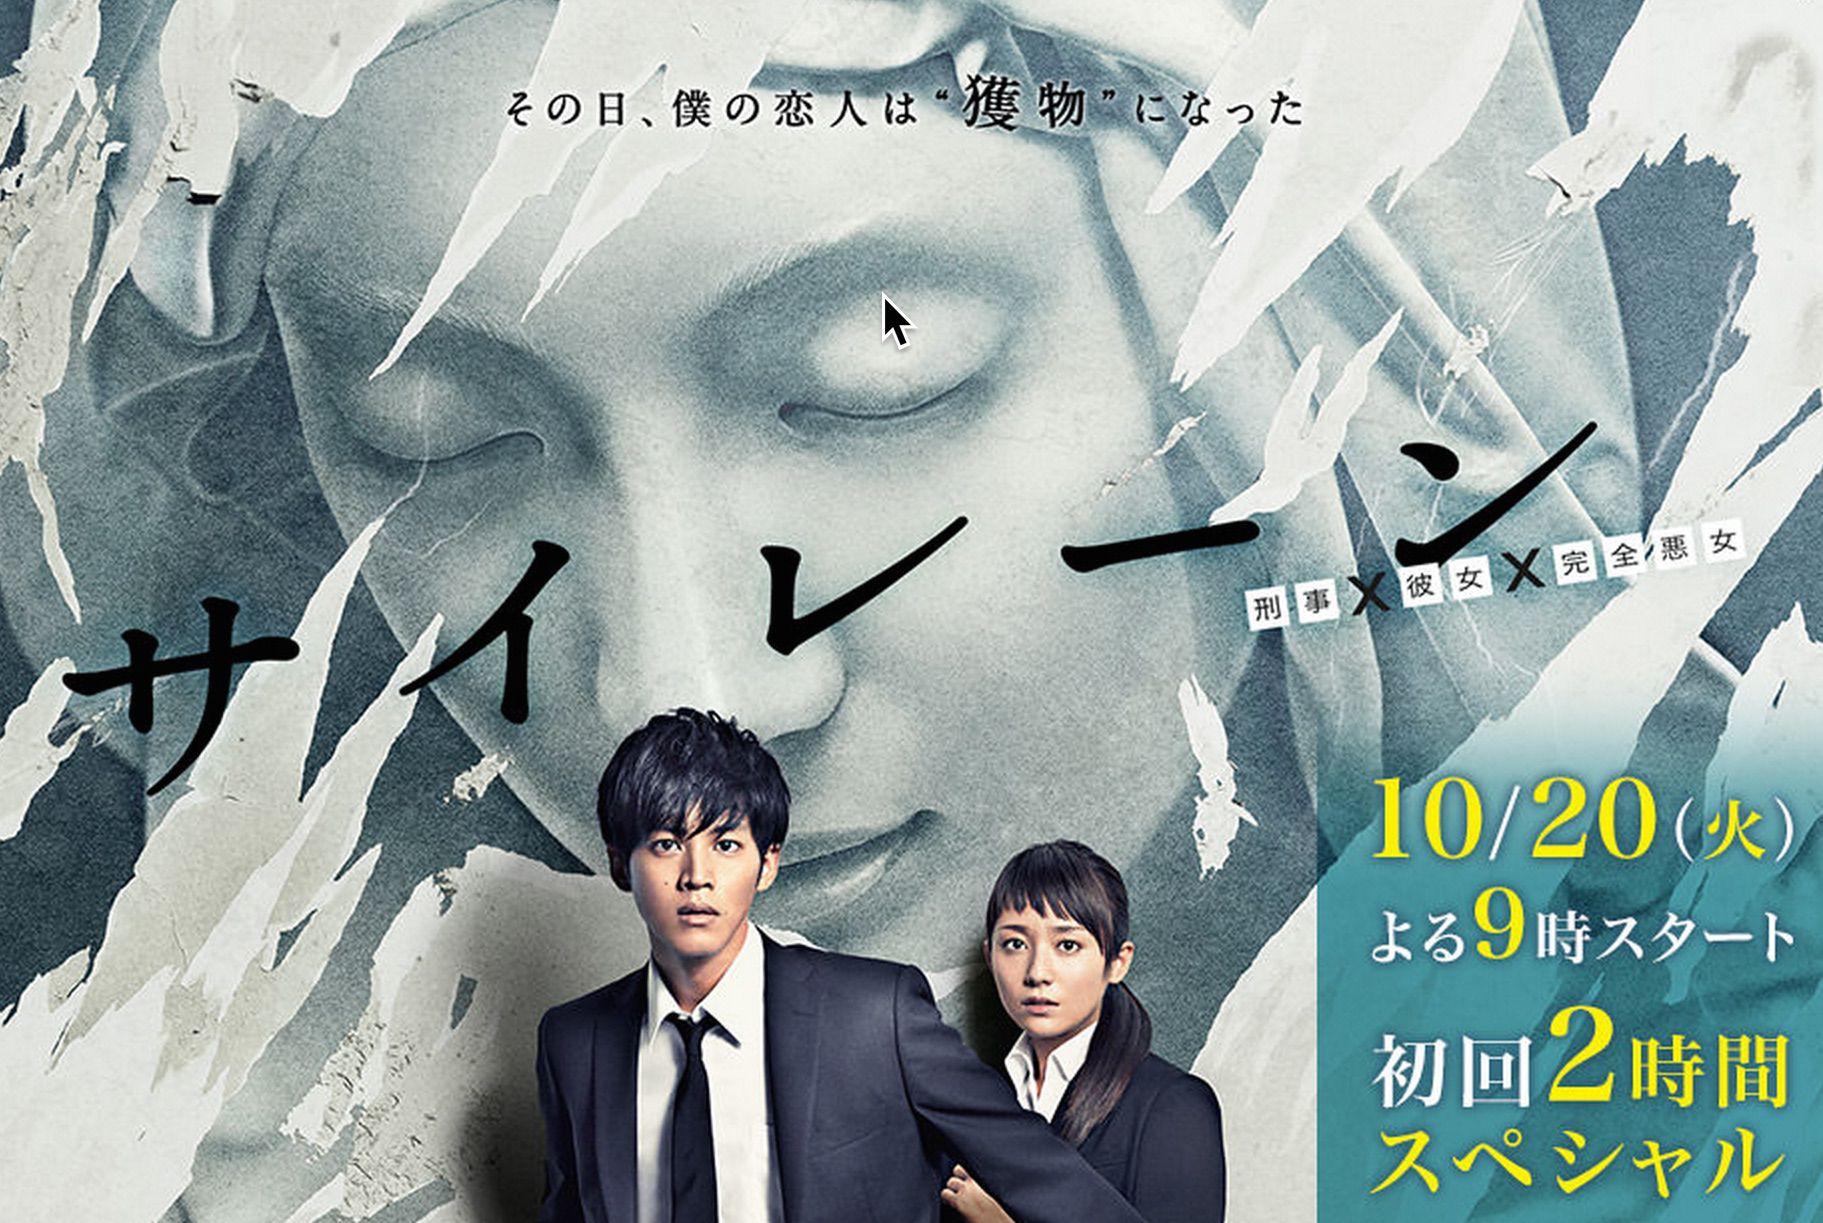 J Drama Stunning siren (japanese drama) - asianwiki